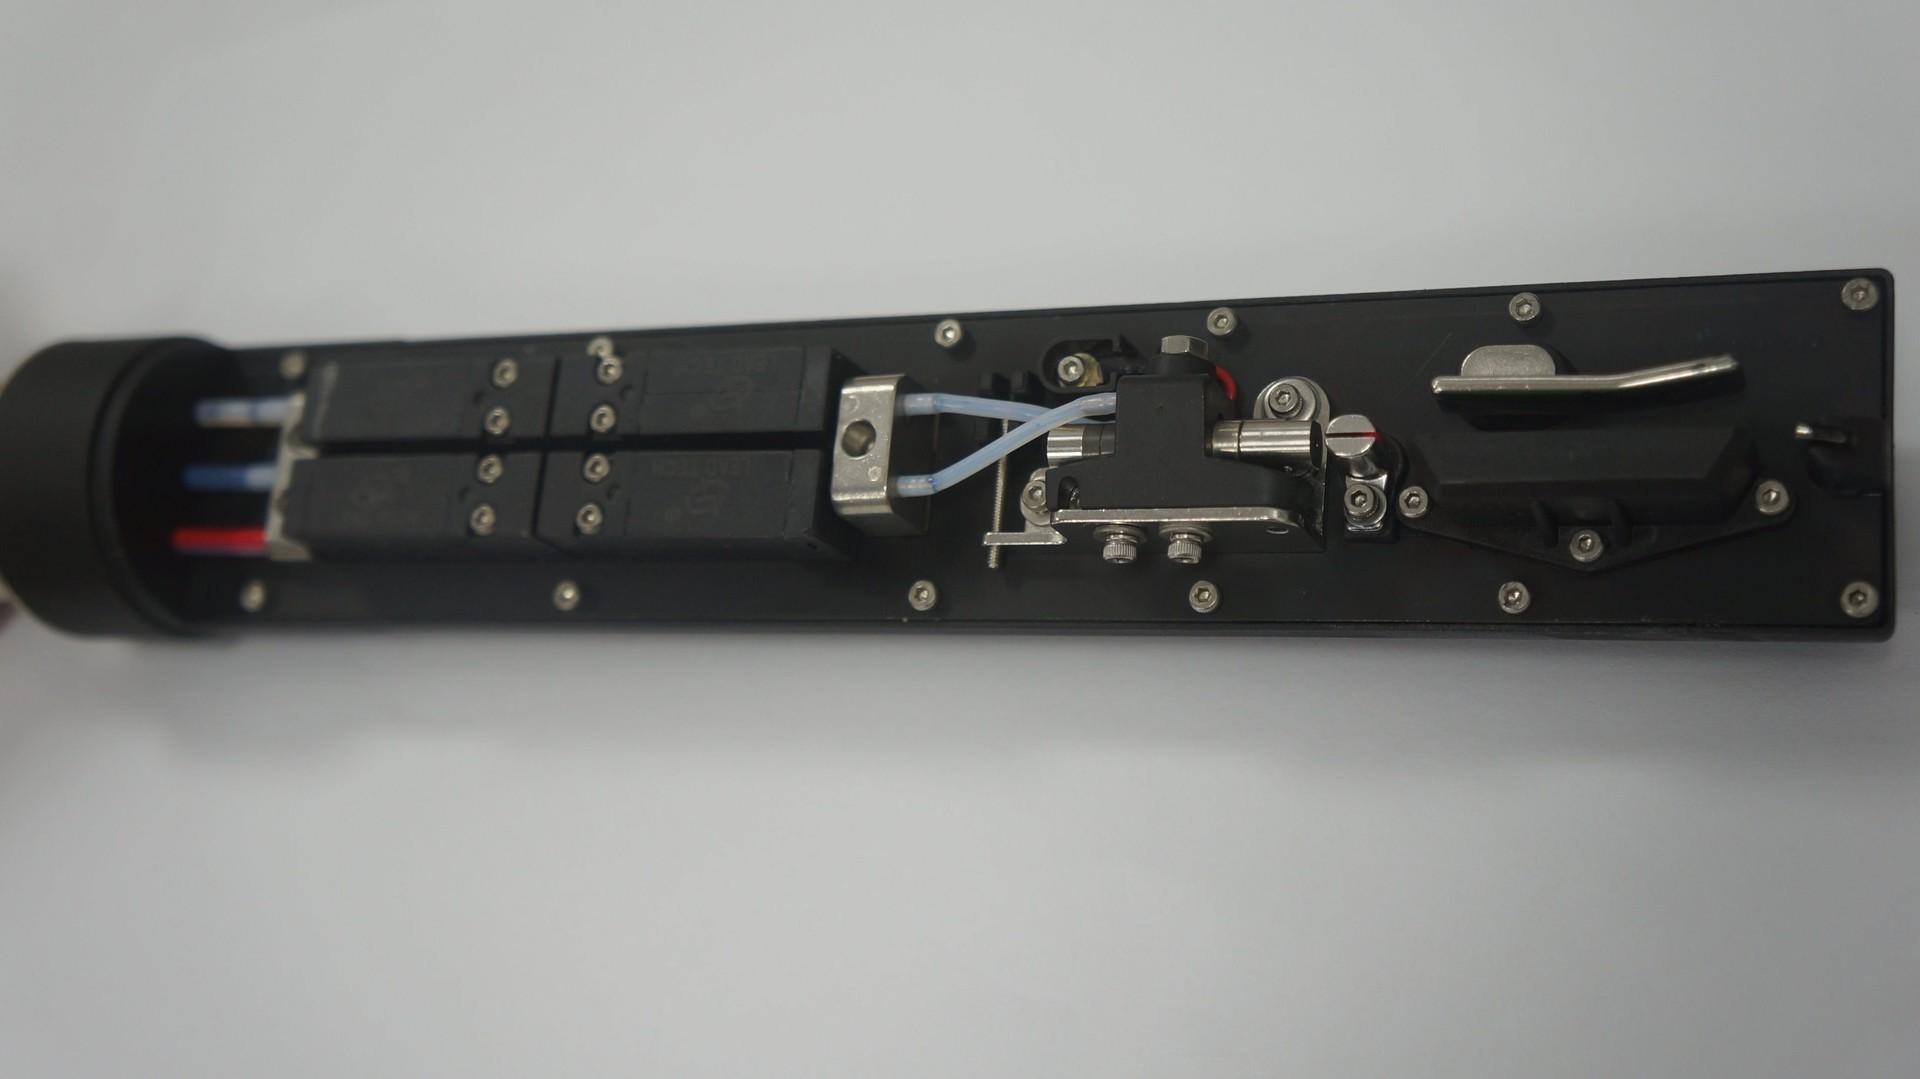 Lead Tech Lt800 Expiry Date Printing Eco Solvent Printer